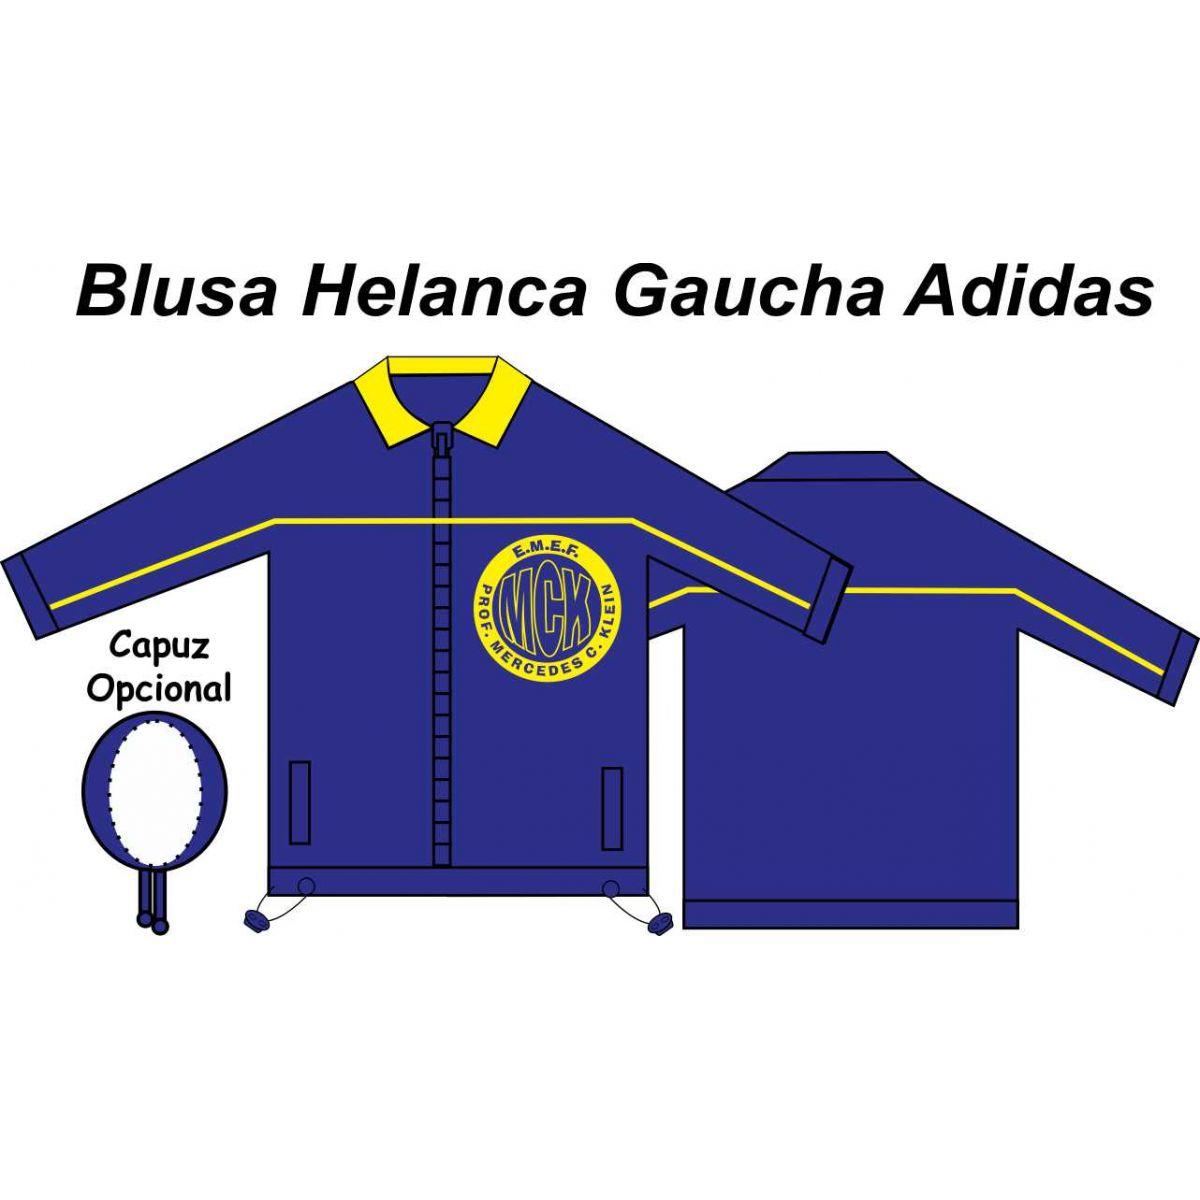 Blusa Helanca Gaucha Adidas Aberta Mercedes